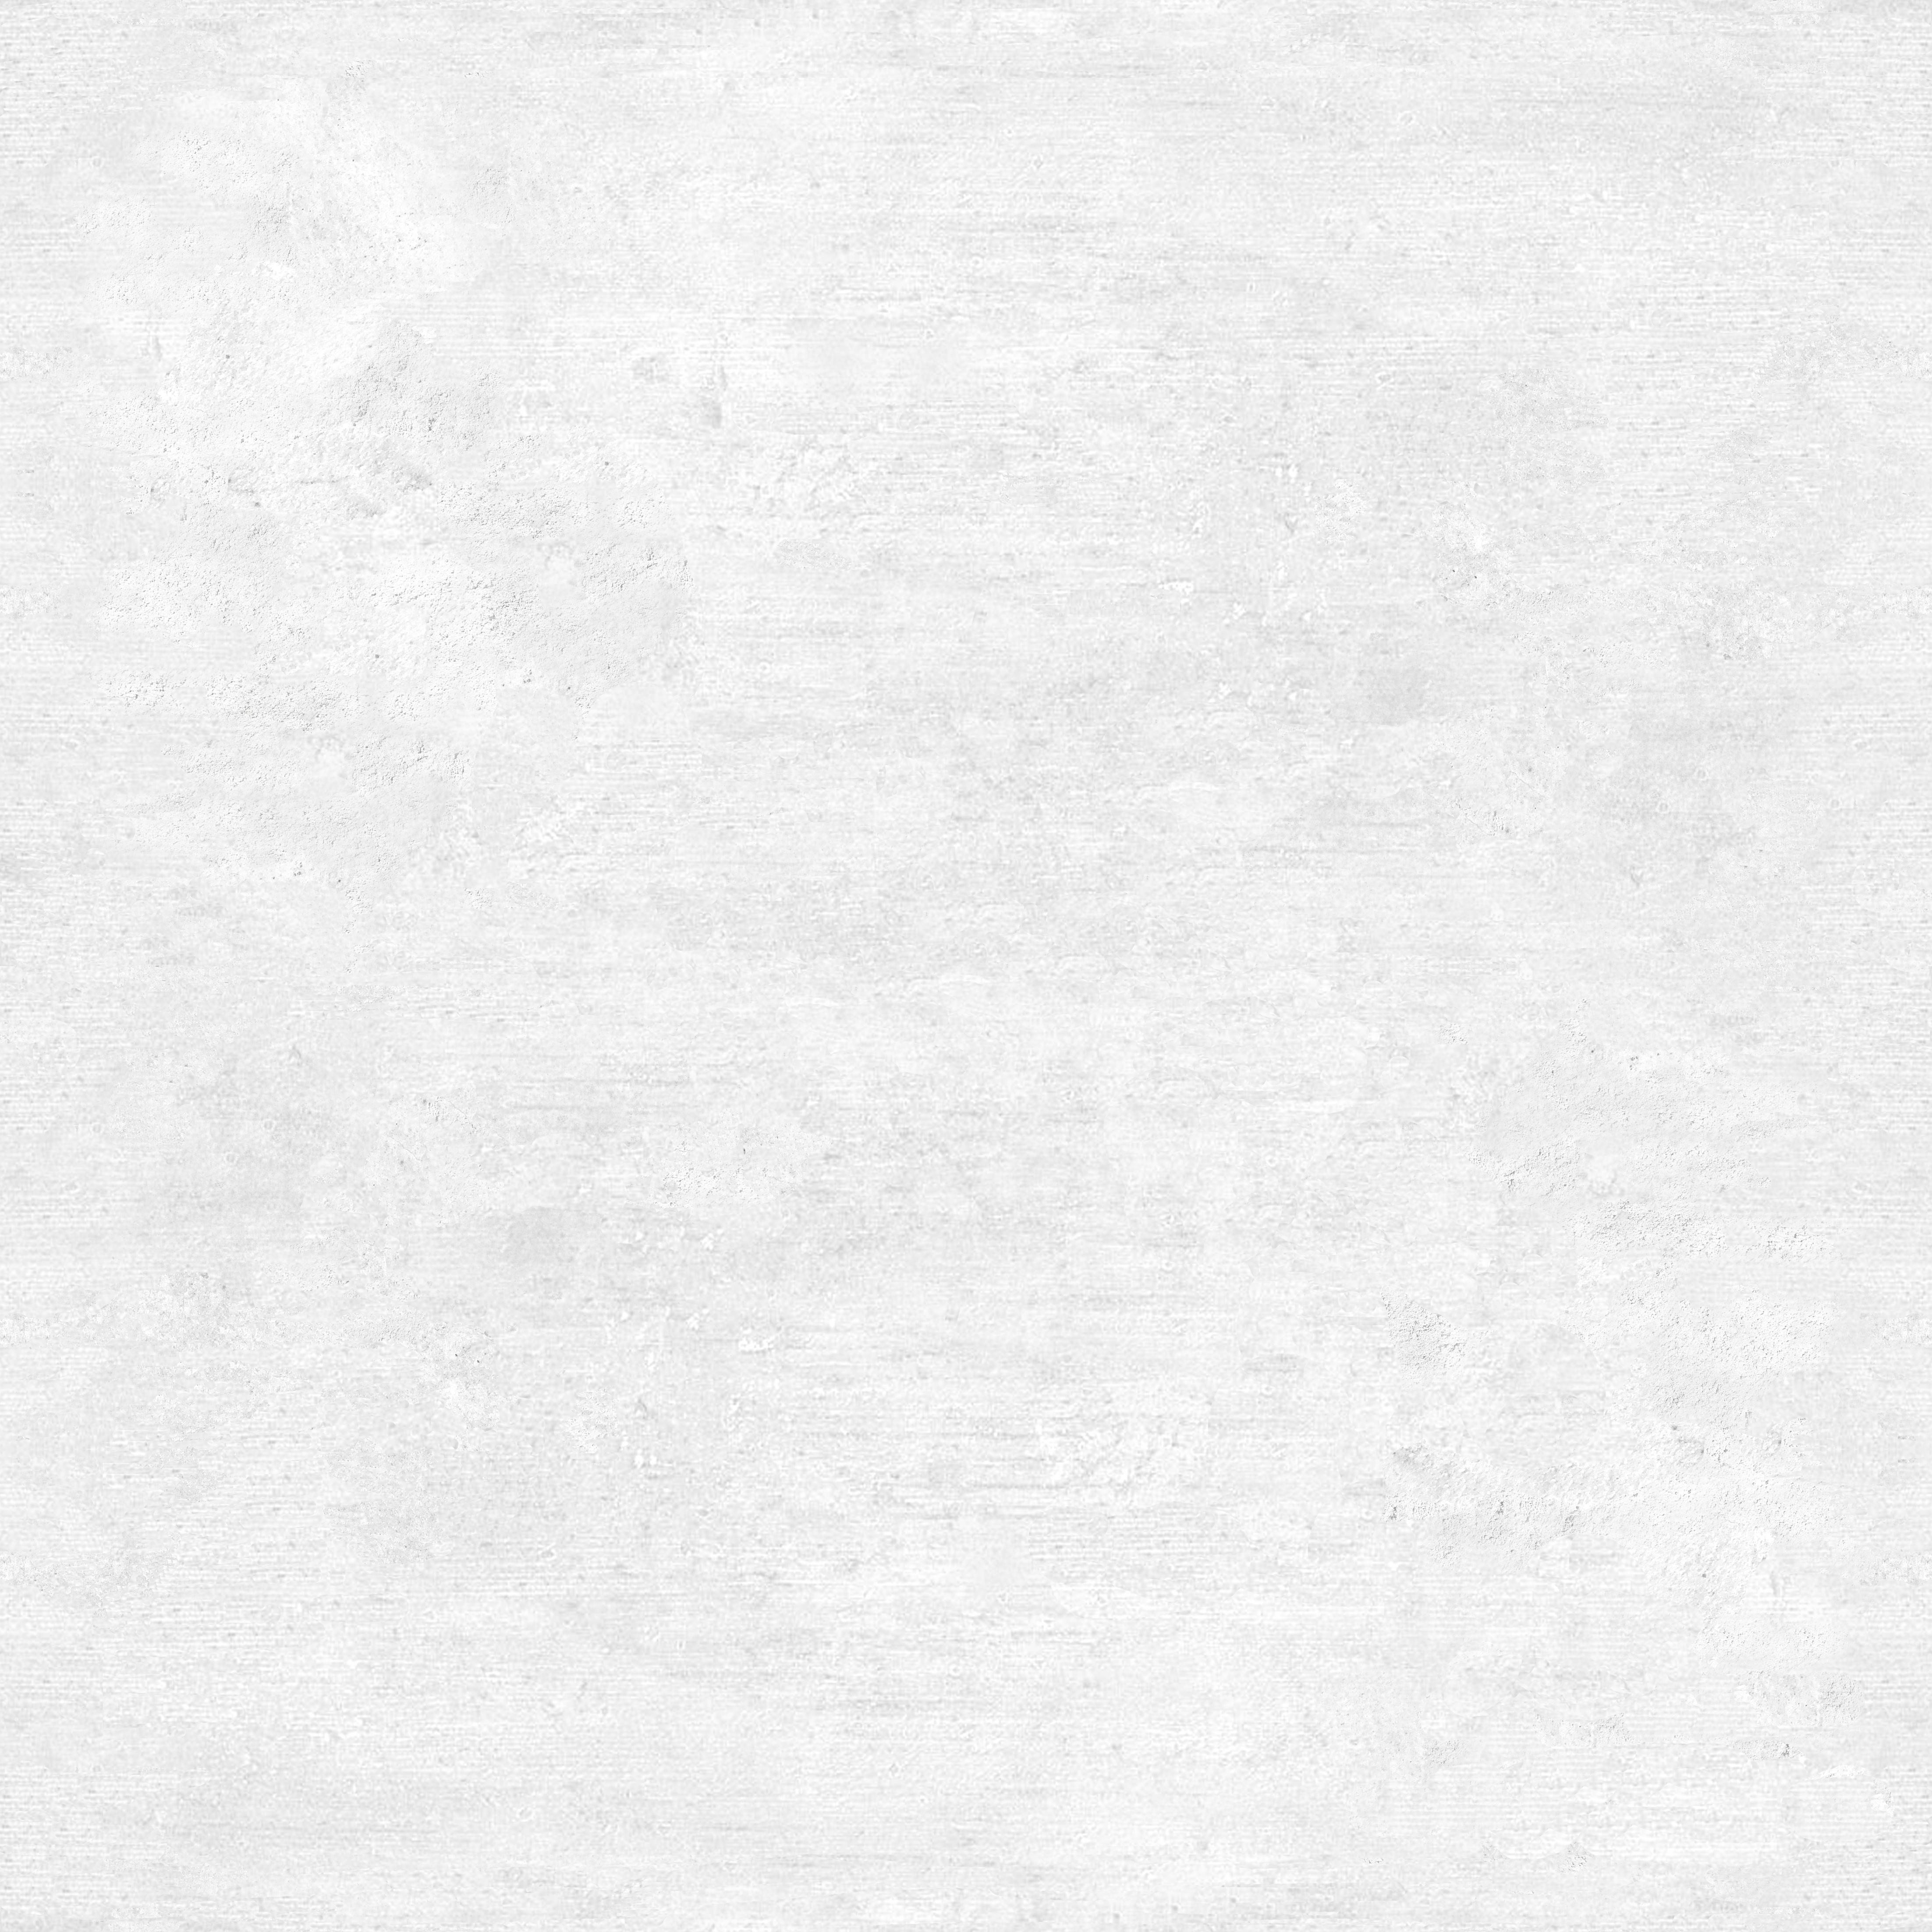 белый бетон текстура бесшовная